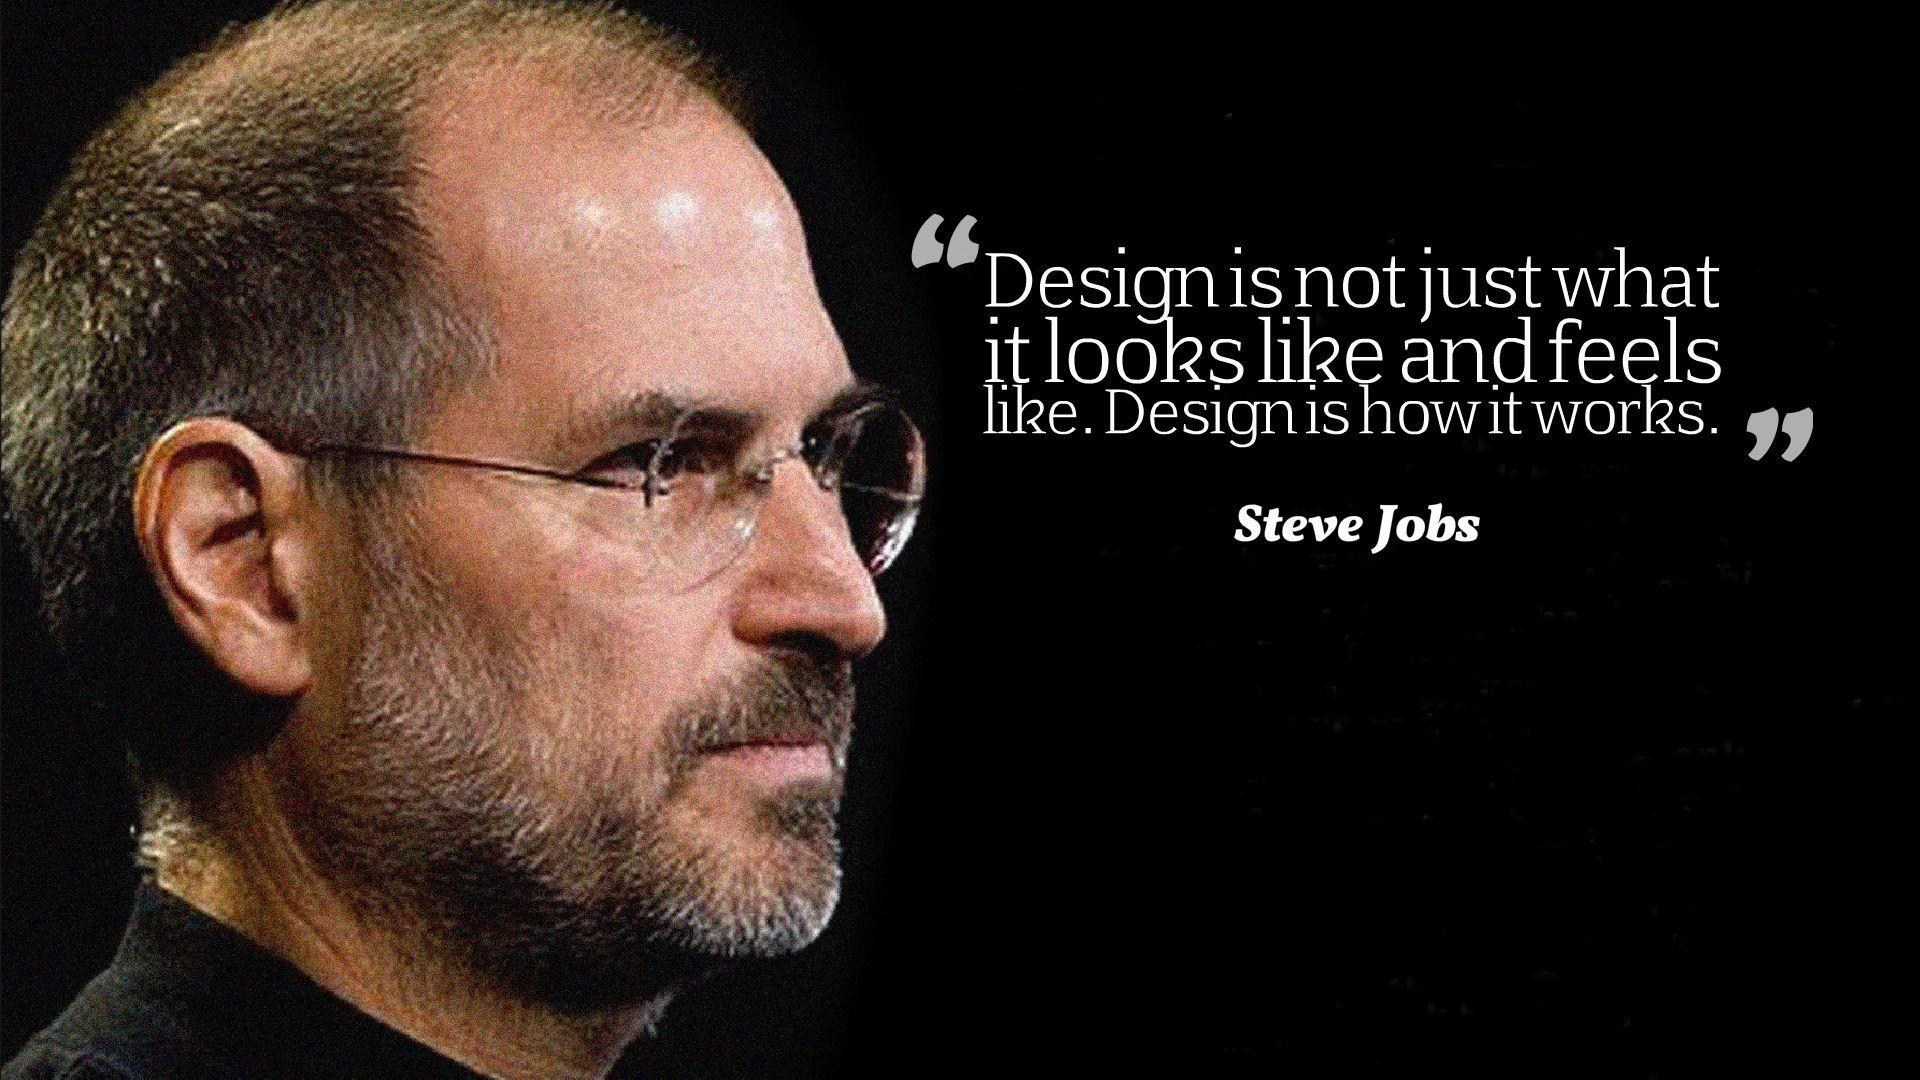 Iphone 6 Wallpaper Steve Jobs Quote Steve Jobs Quotes Wallpaper 10889 Baltana